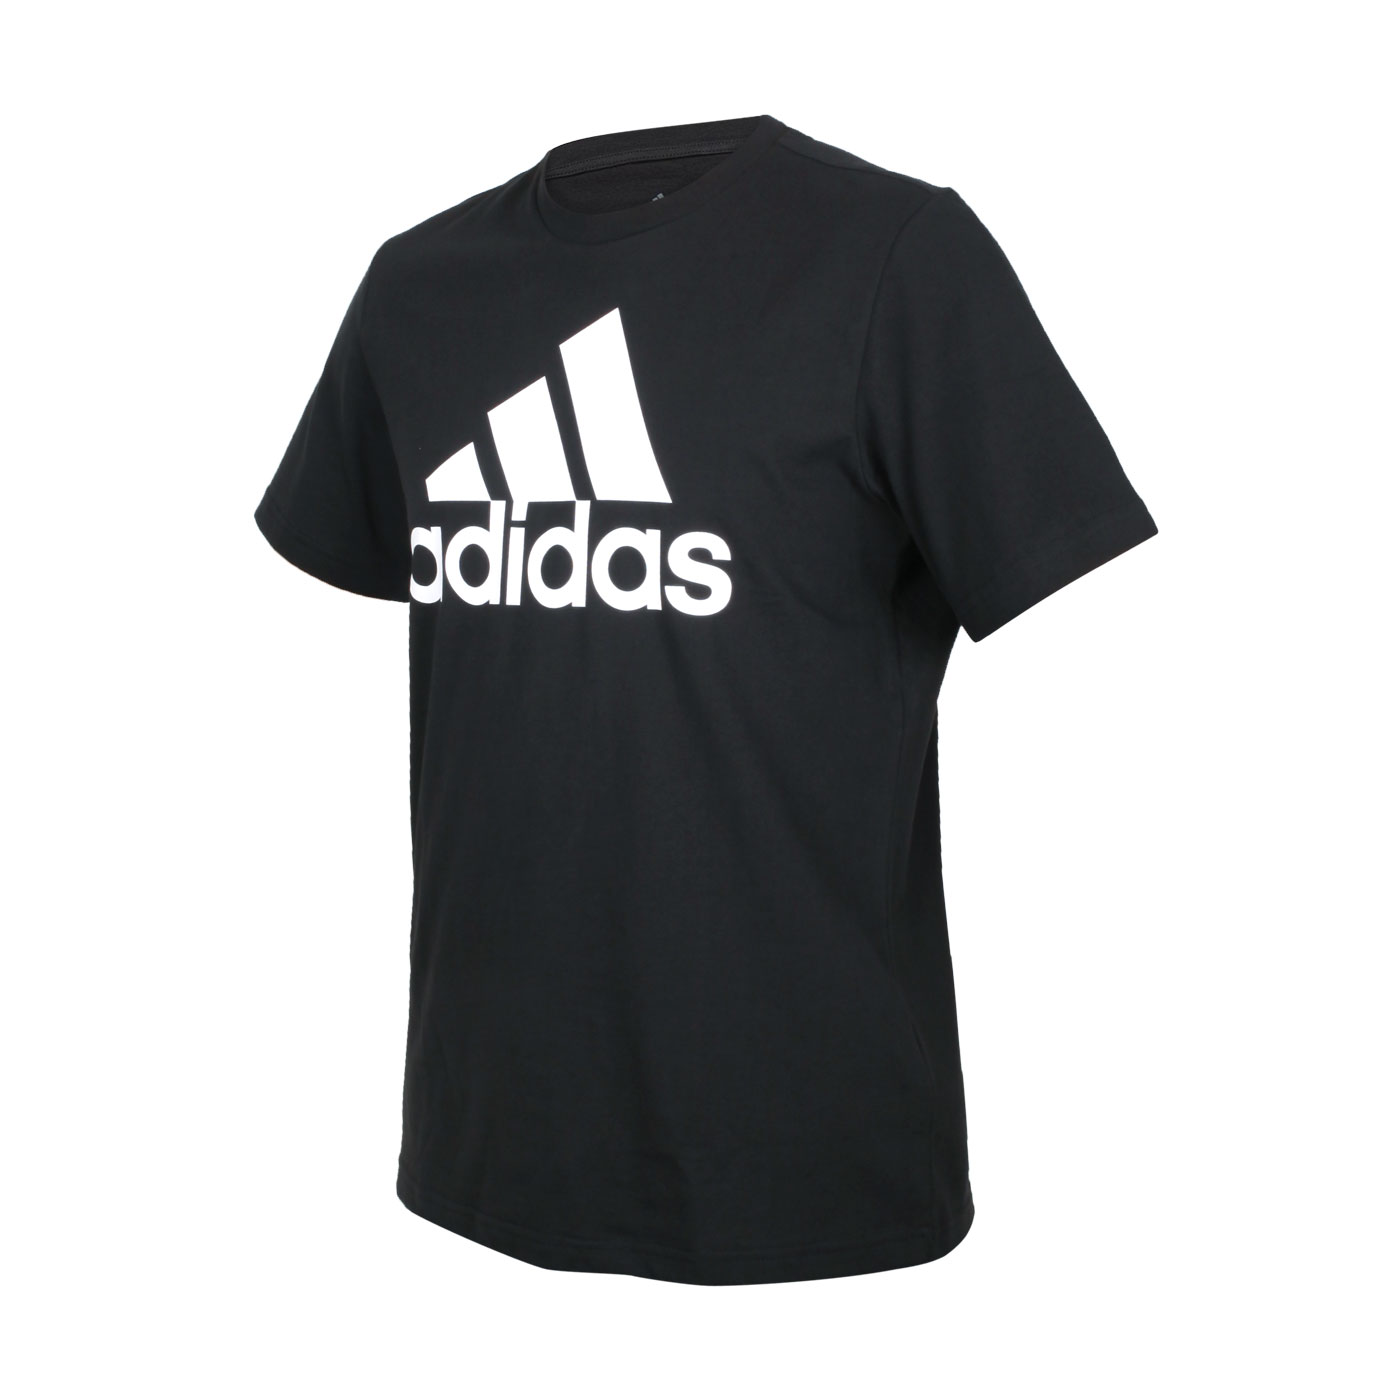 ADIDAS 男款短袖T恤 GK9120 - 黑白